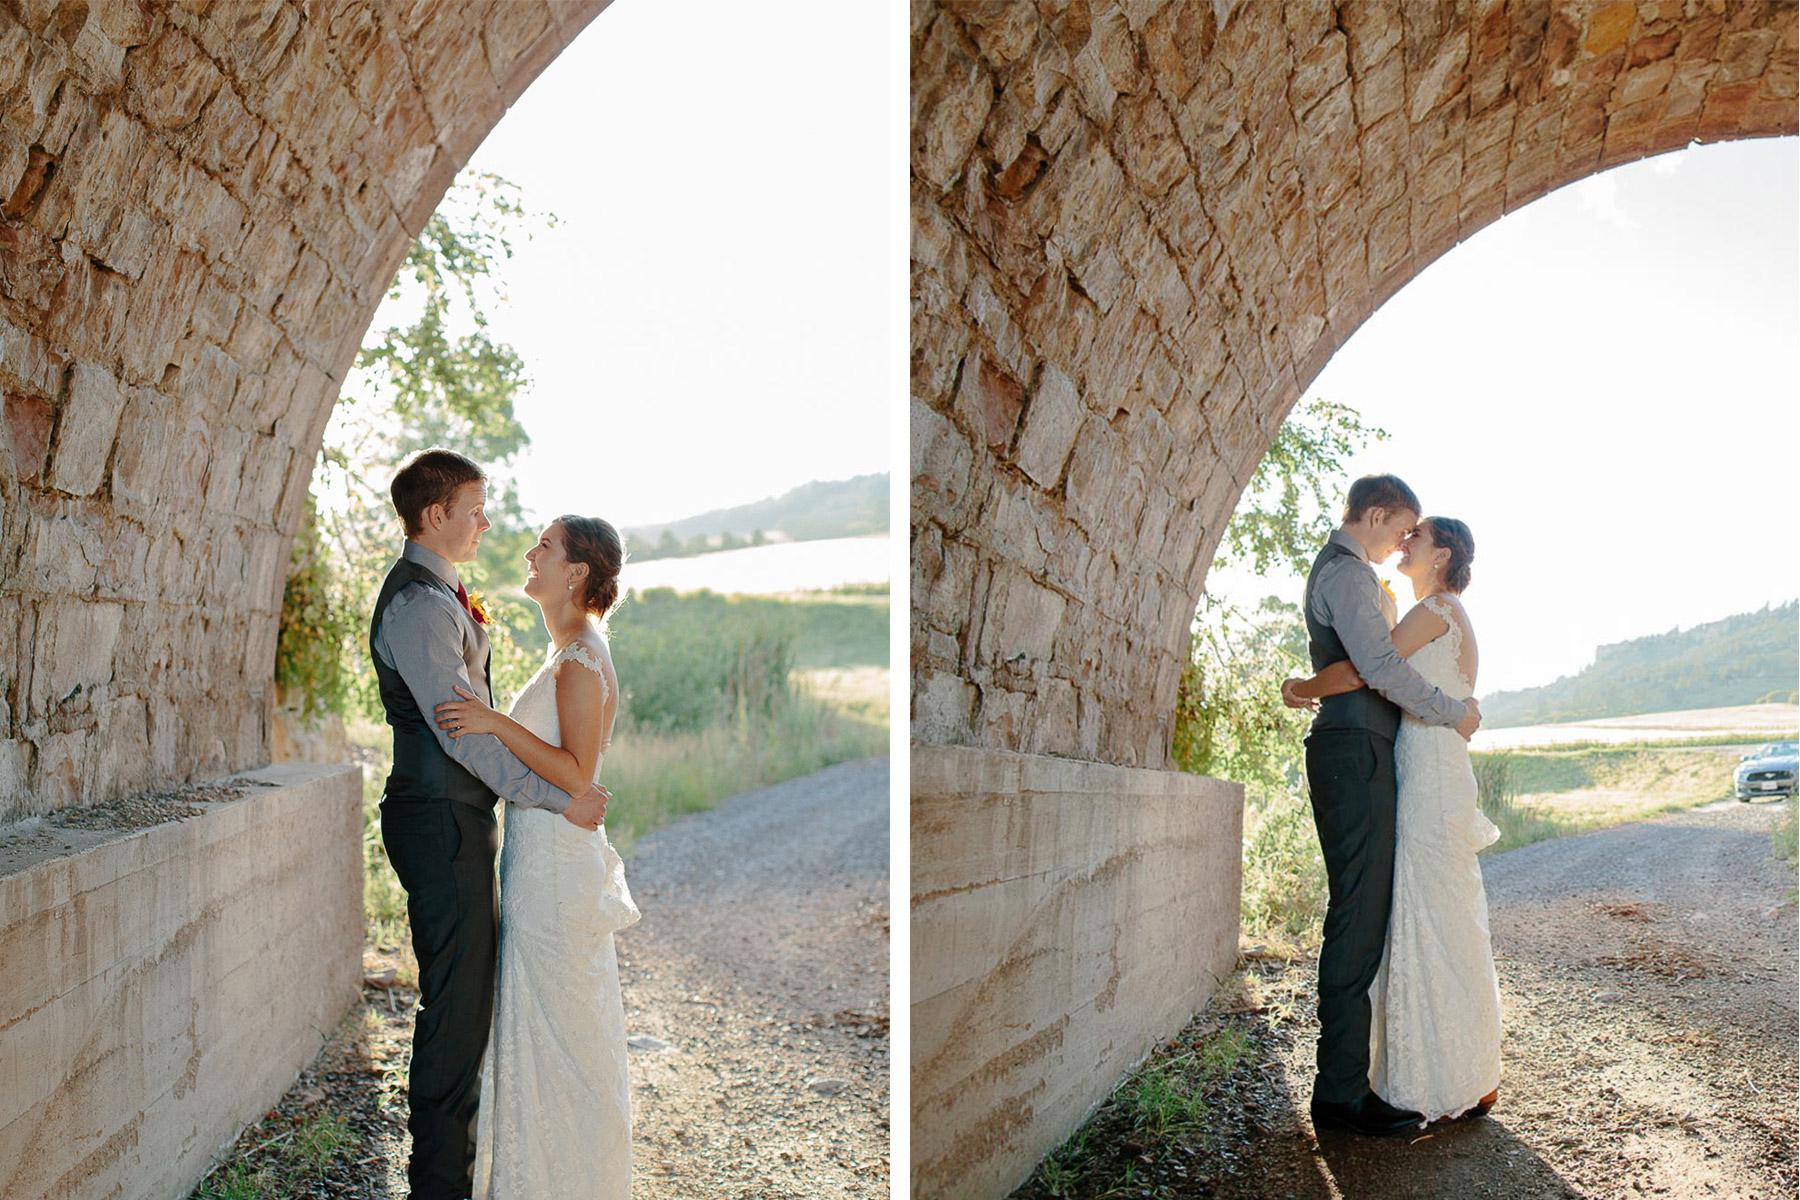 160902-Luxium-Weddings-Arizona-Michael-Becca-Spruce-Mountain-Ranch-Colorado-webres-086.jpg